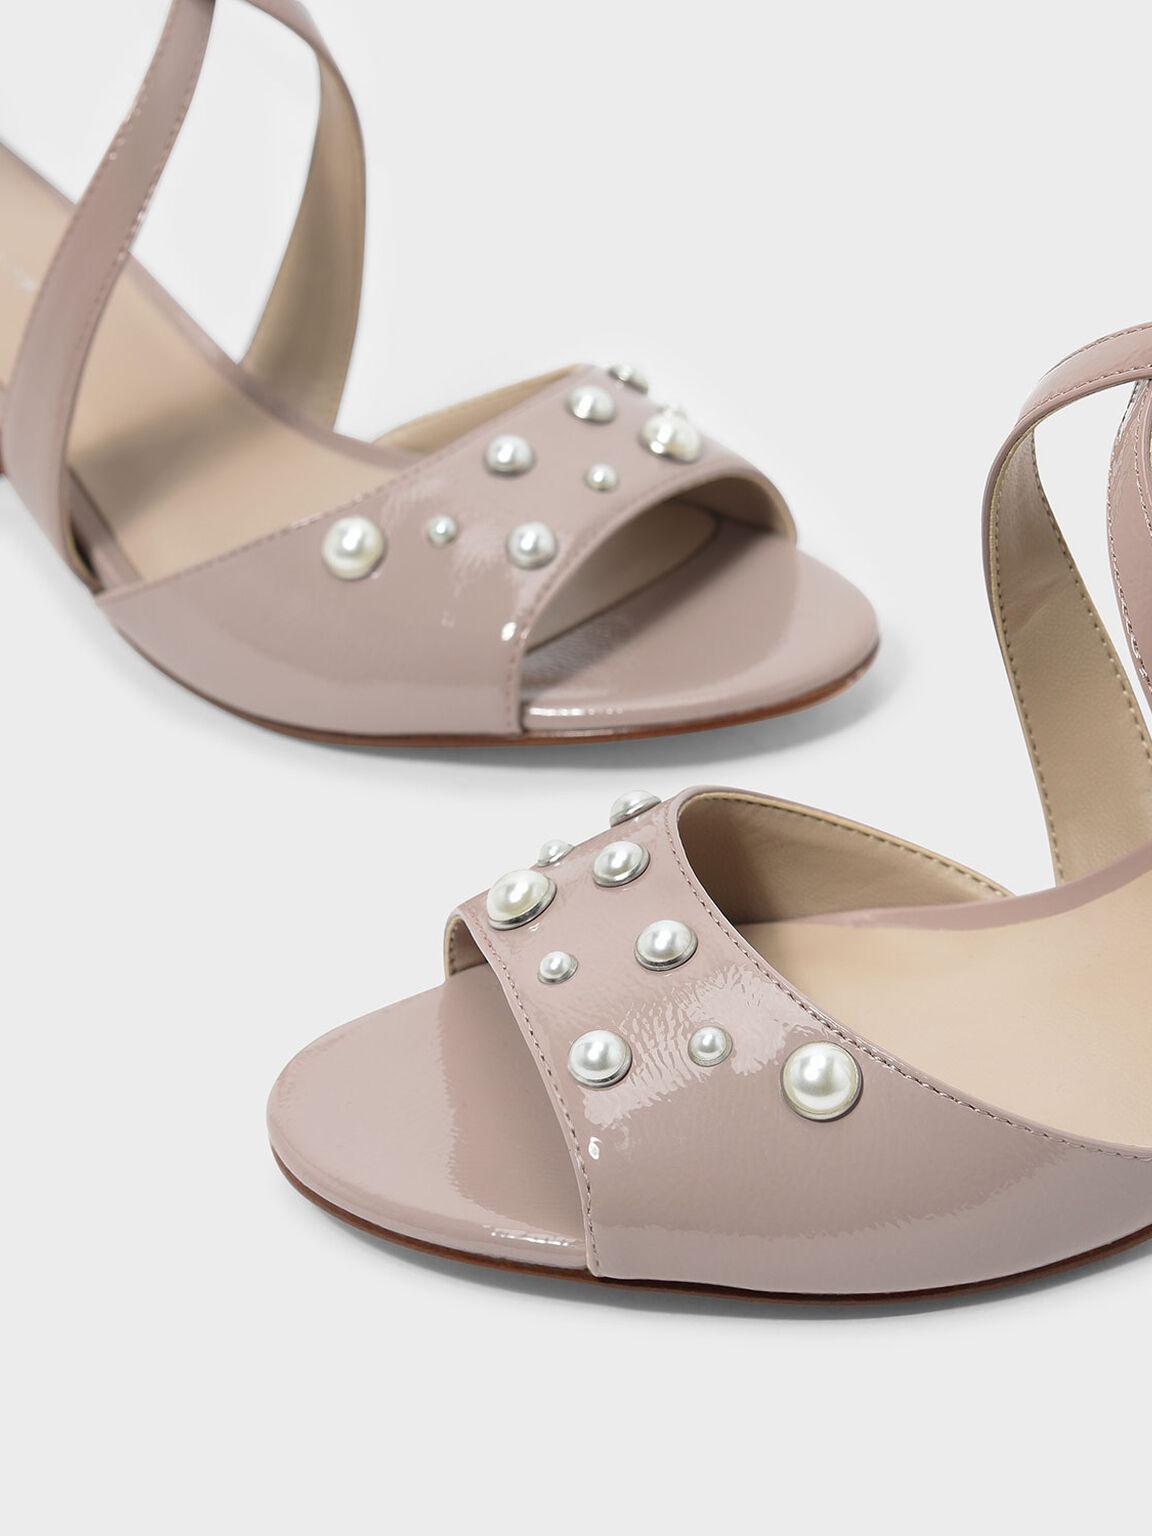 Pearl Detail Criss Cross Heels, Nude, hi-res